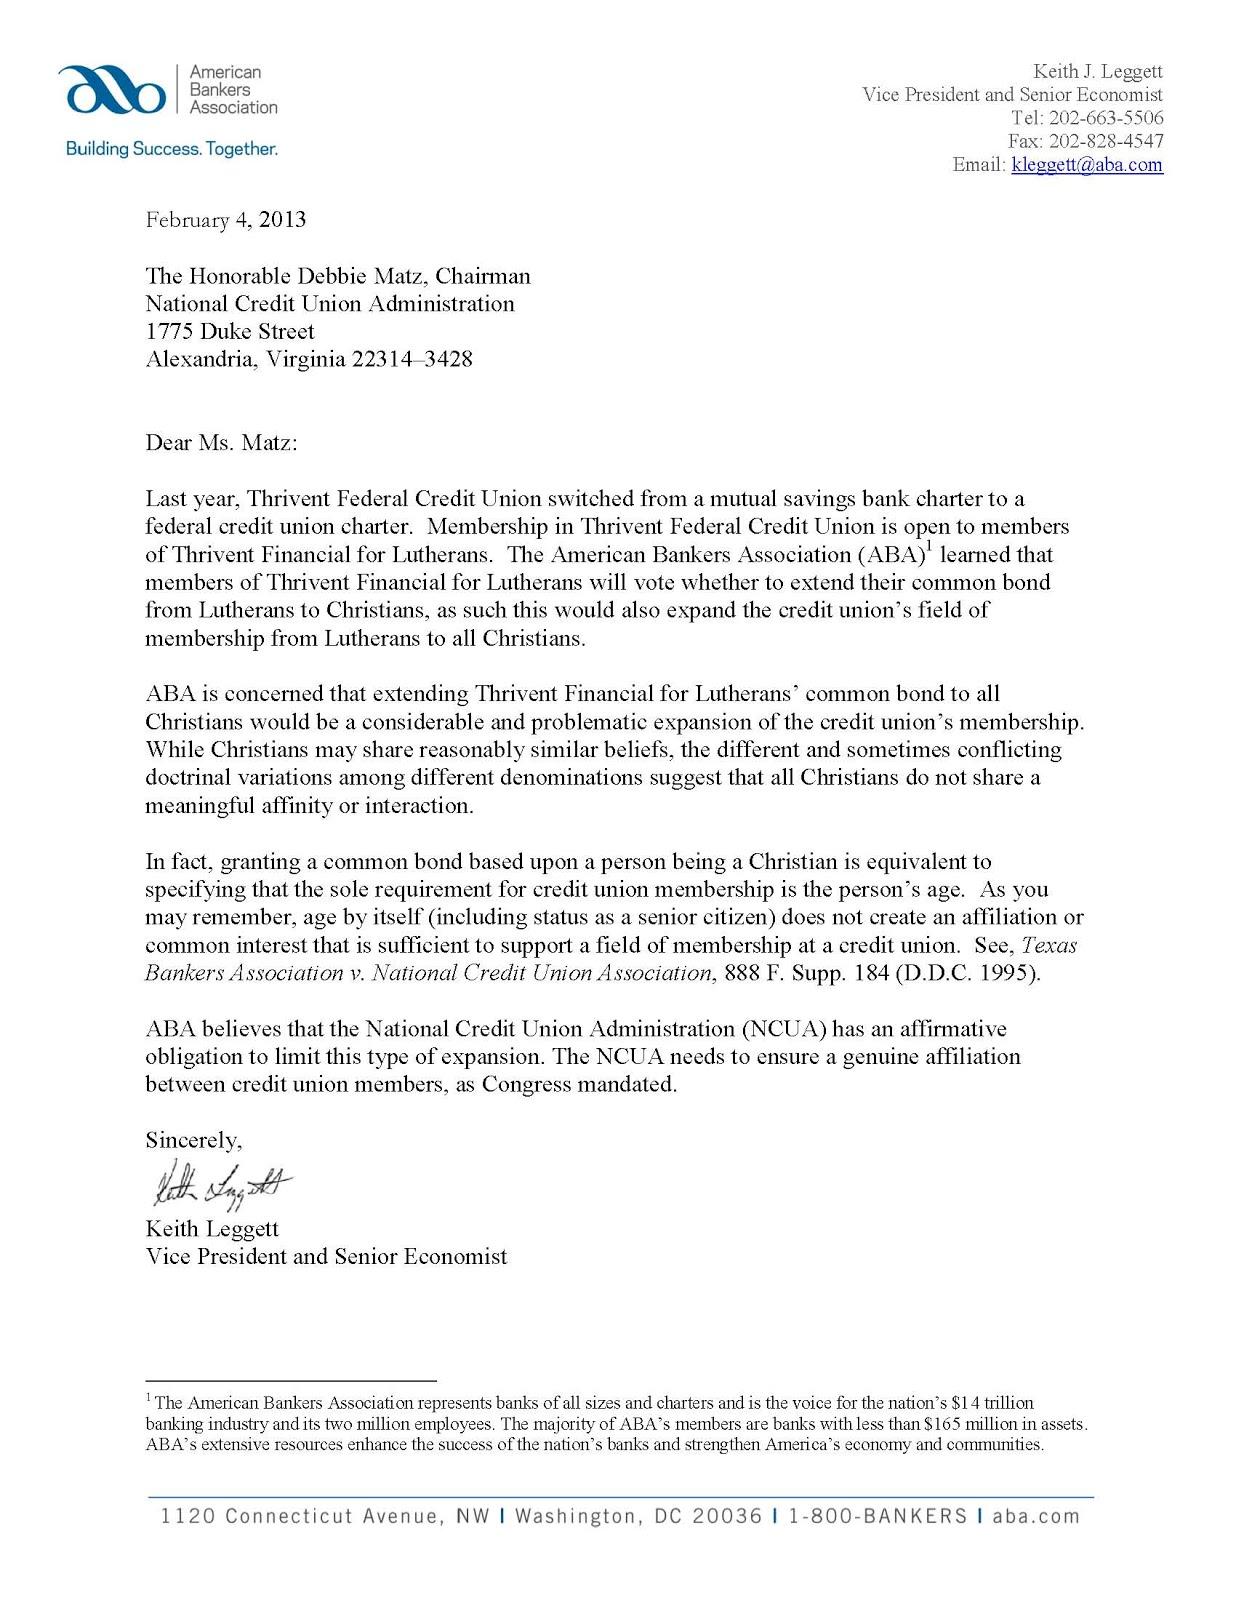 Doc460595 Event Sponsorship Agreement Template Sponsorship – Sponsorship Agreement Letter